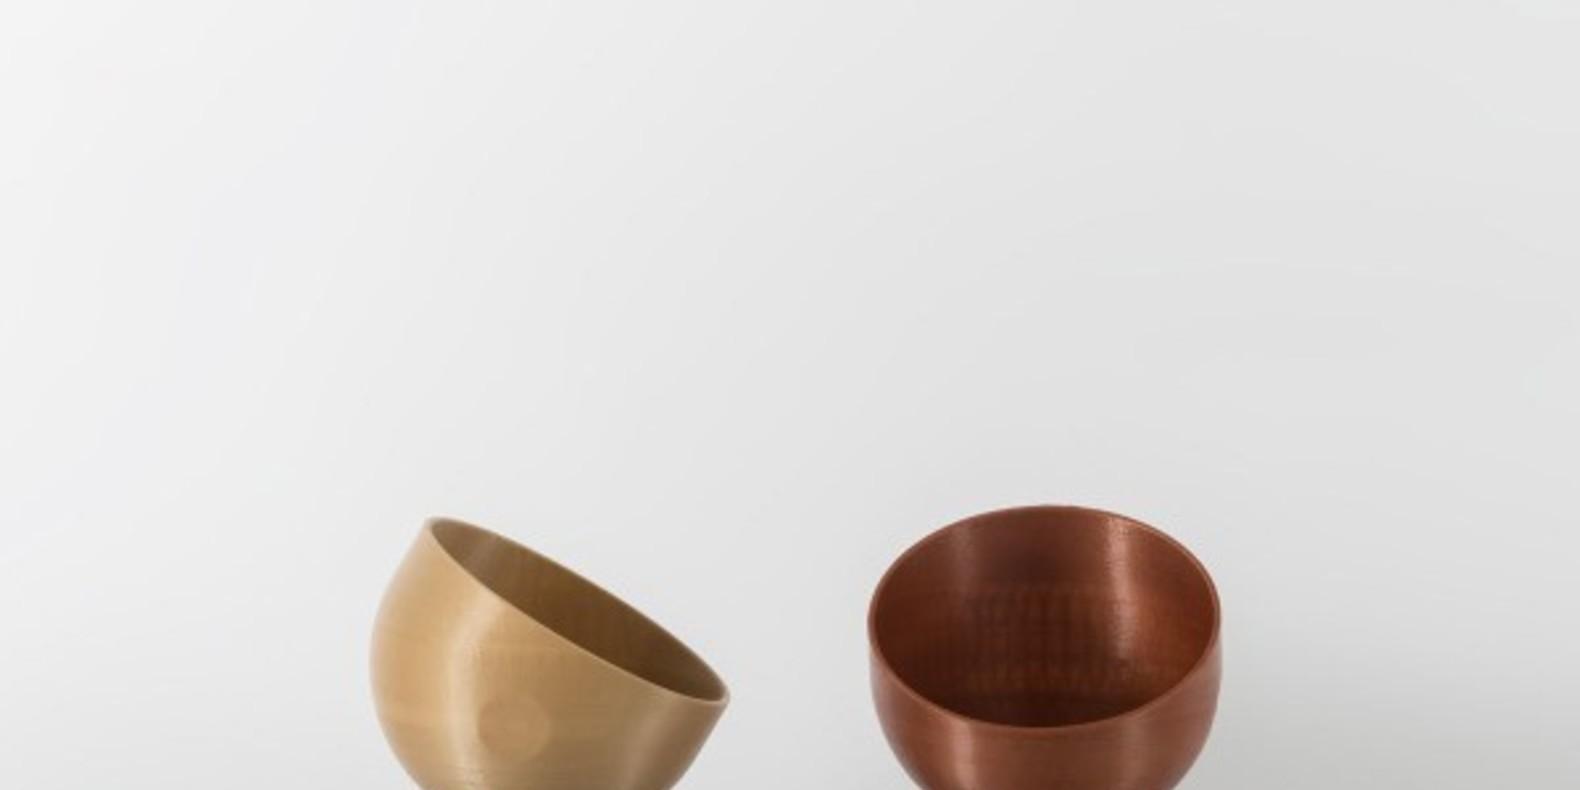 http://fichier3d.fr/wp-content/uploads/2016/04/lampe-porte-casque-capsules-nespresso-ipad-eumakers-bobines-spools-filament-impression-3D-fichier-3D-eumakeit-STL-cults-5.jpg